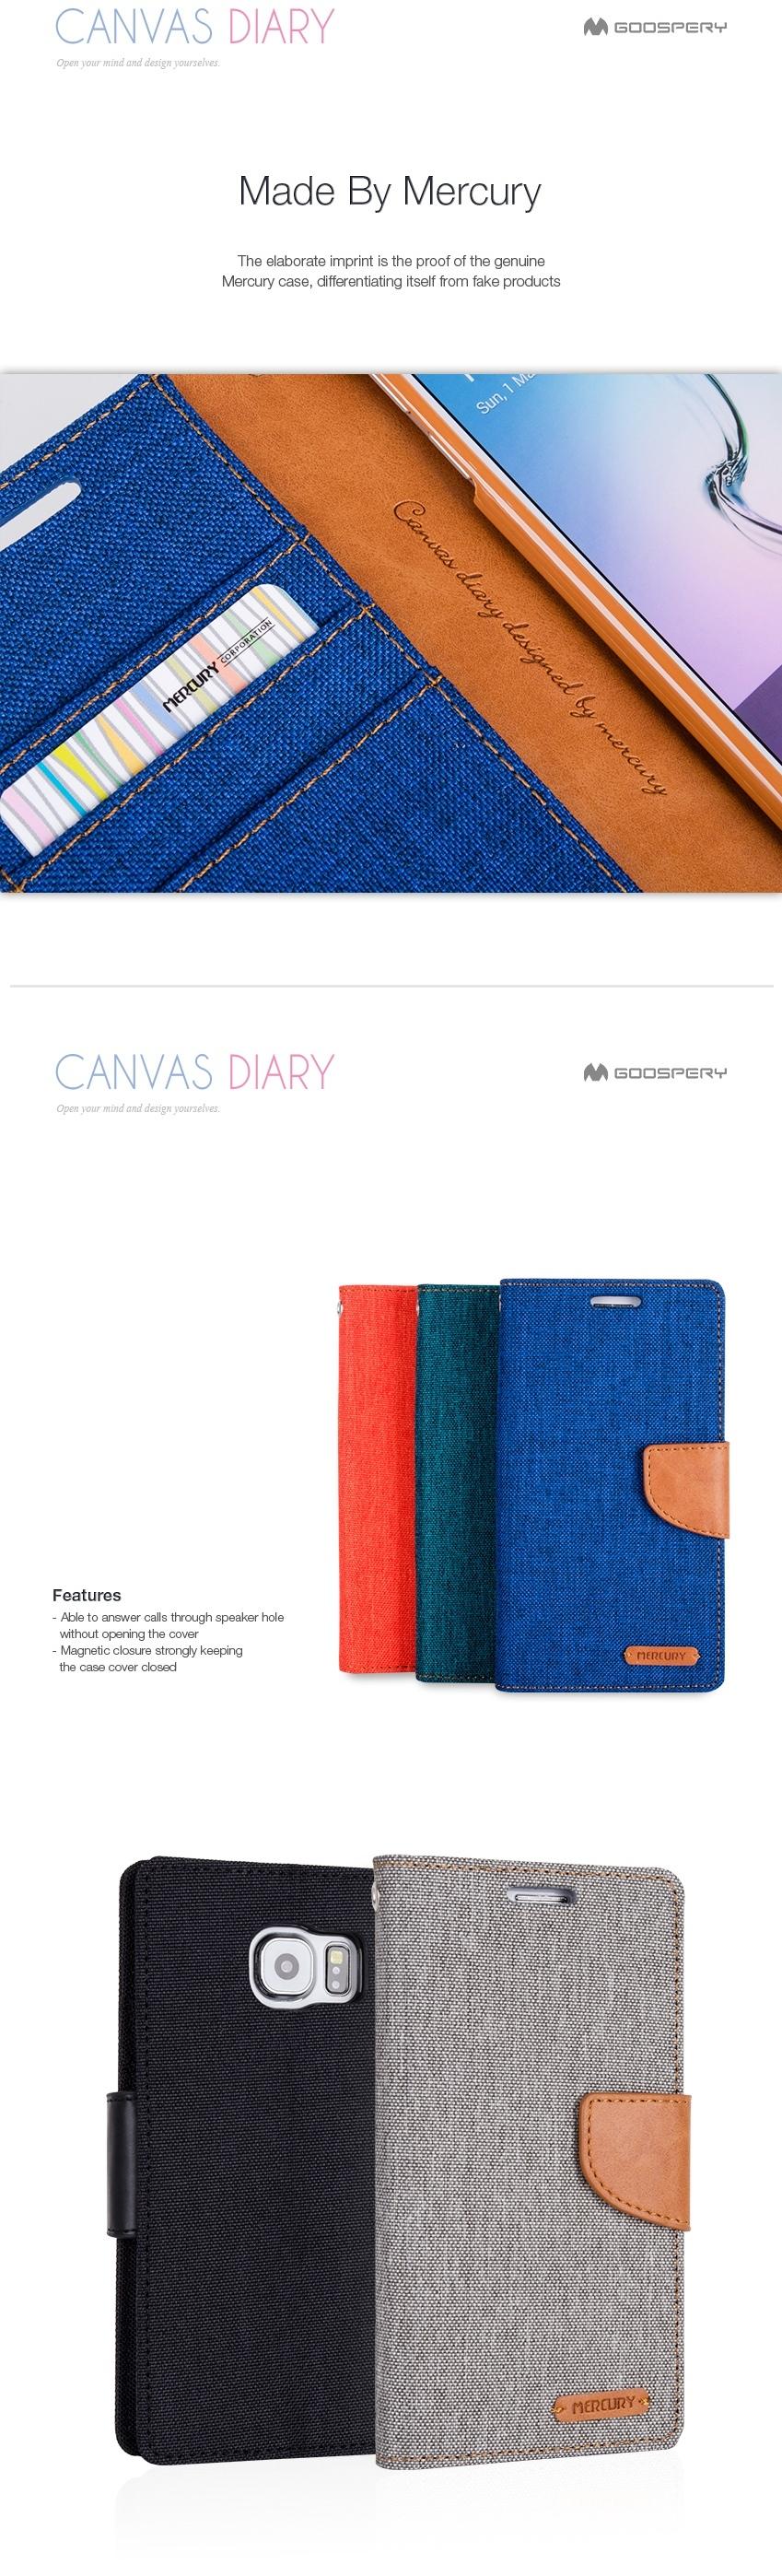 Buy Originalmercury Goospery Canvas Diary Case Samsung Galaxy V Grand Prime Green Highlights